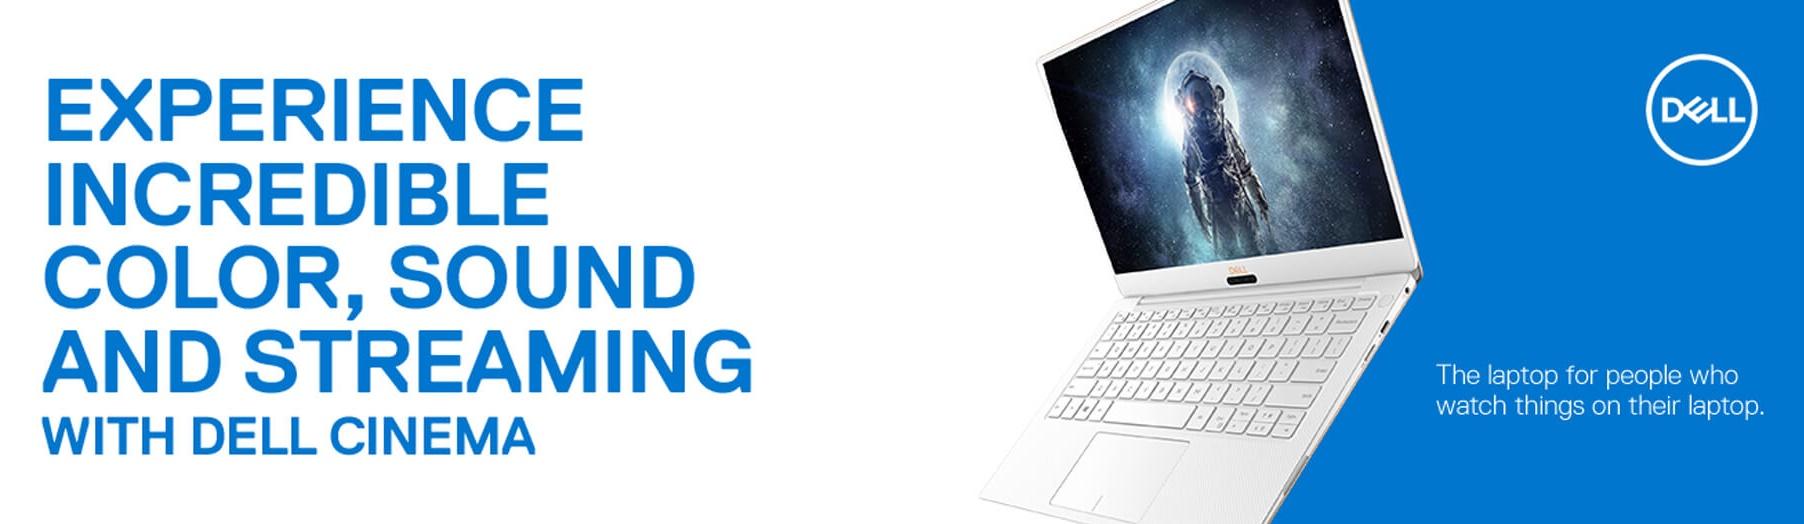 Dell XPS 13 Laptop, 13 3